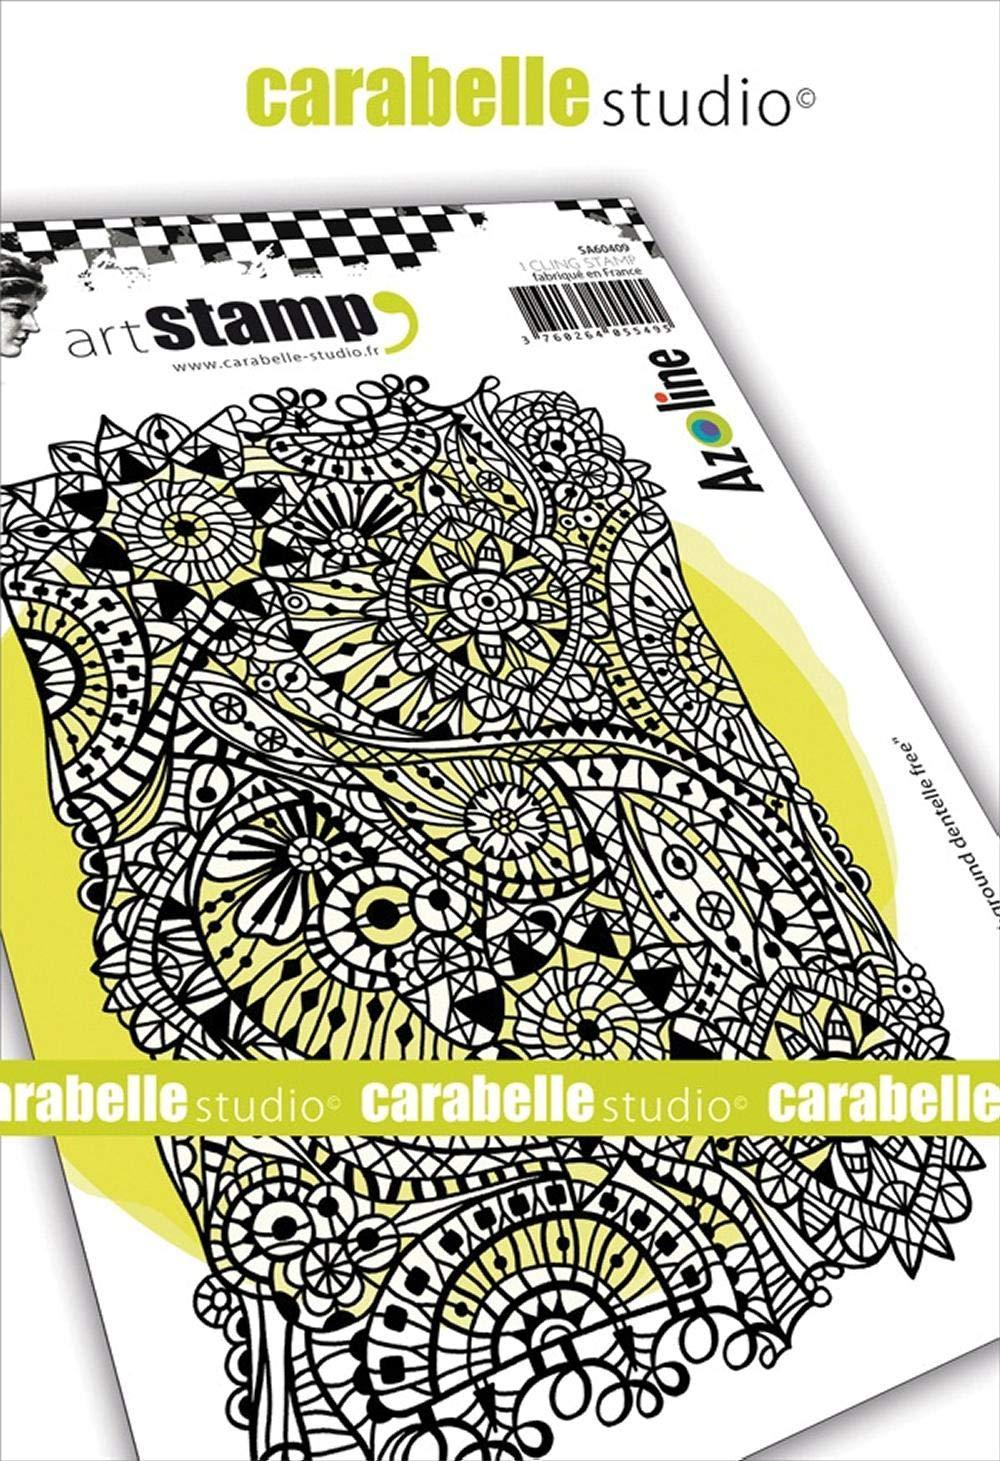 Carabelle Studio TE60072 Stencil Mask A6 Tricot Knitting